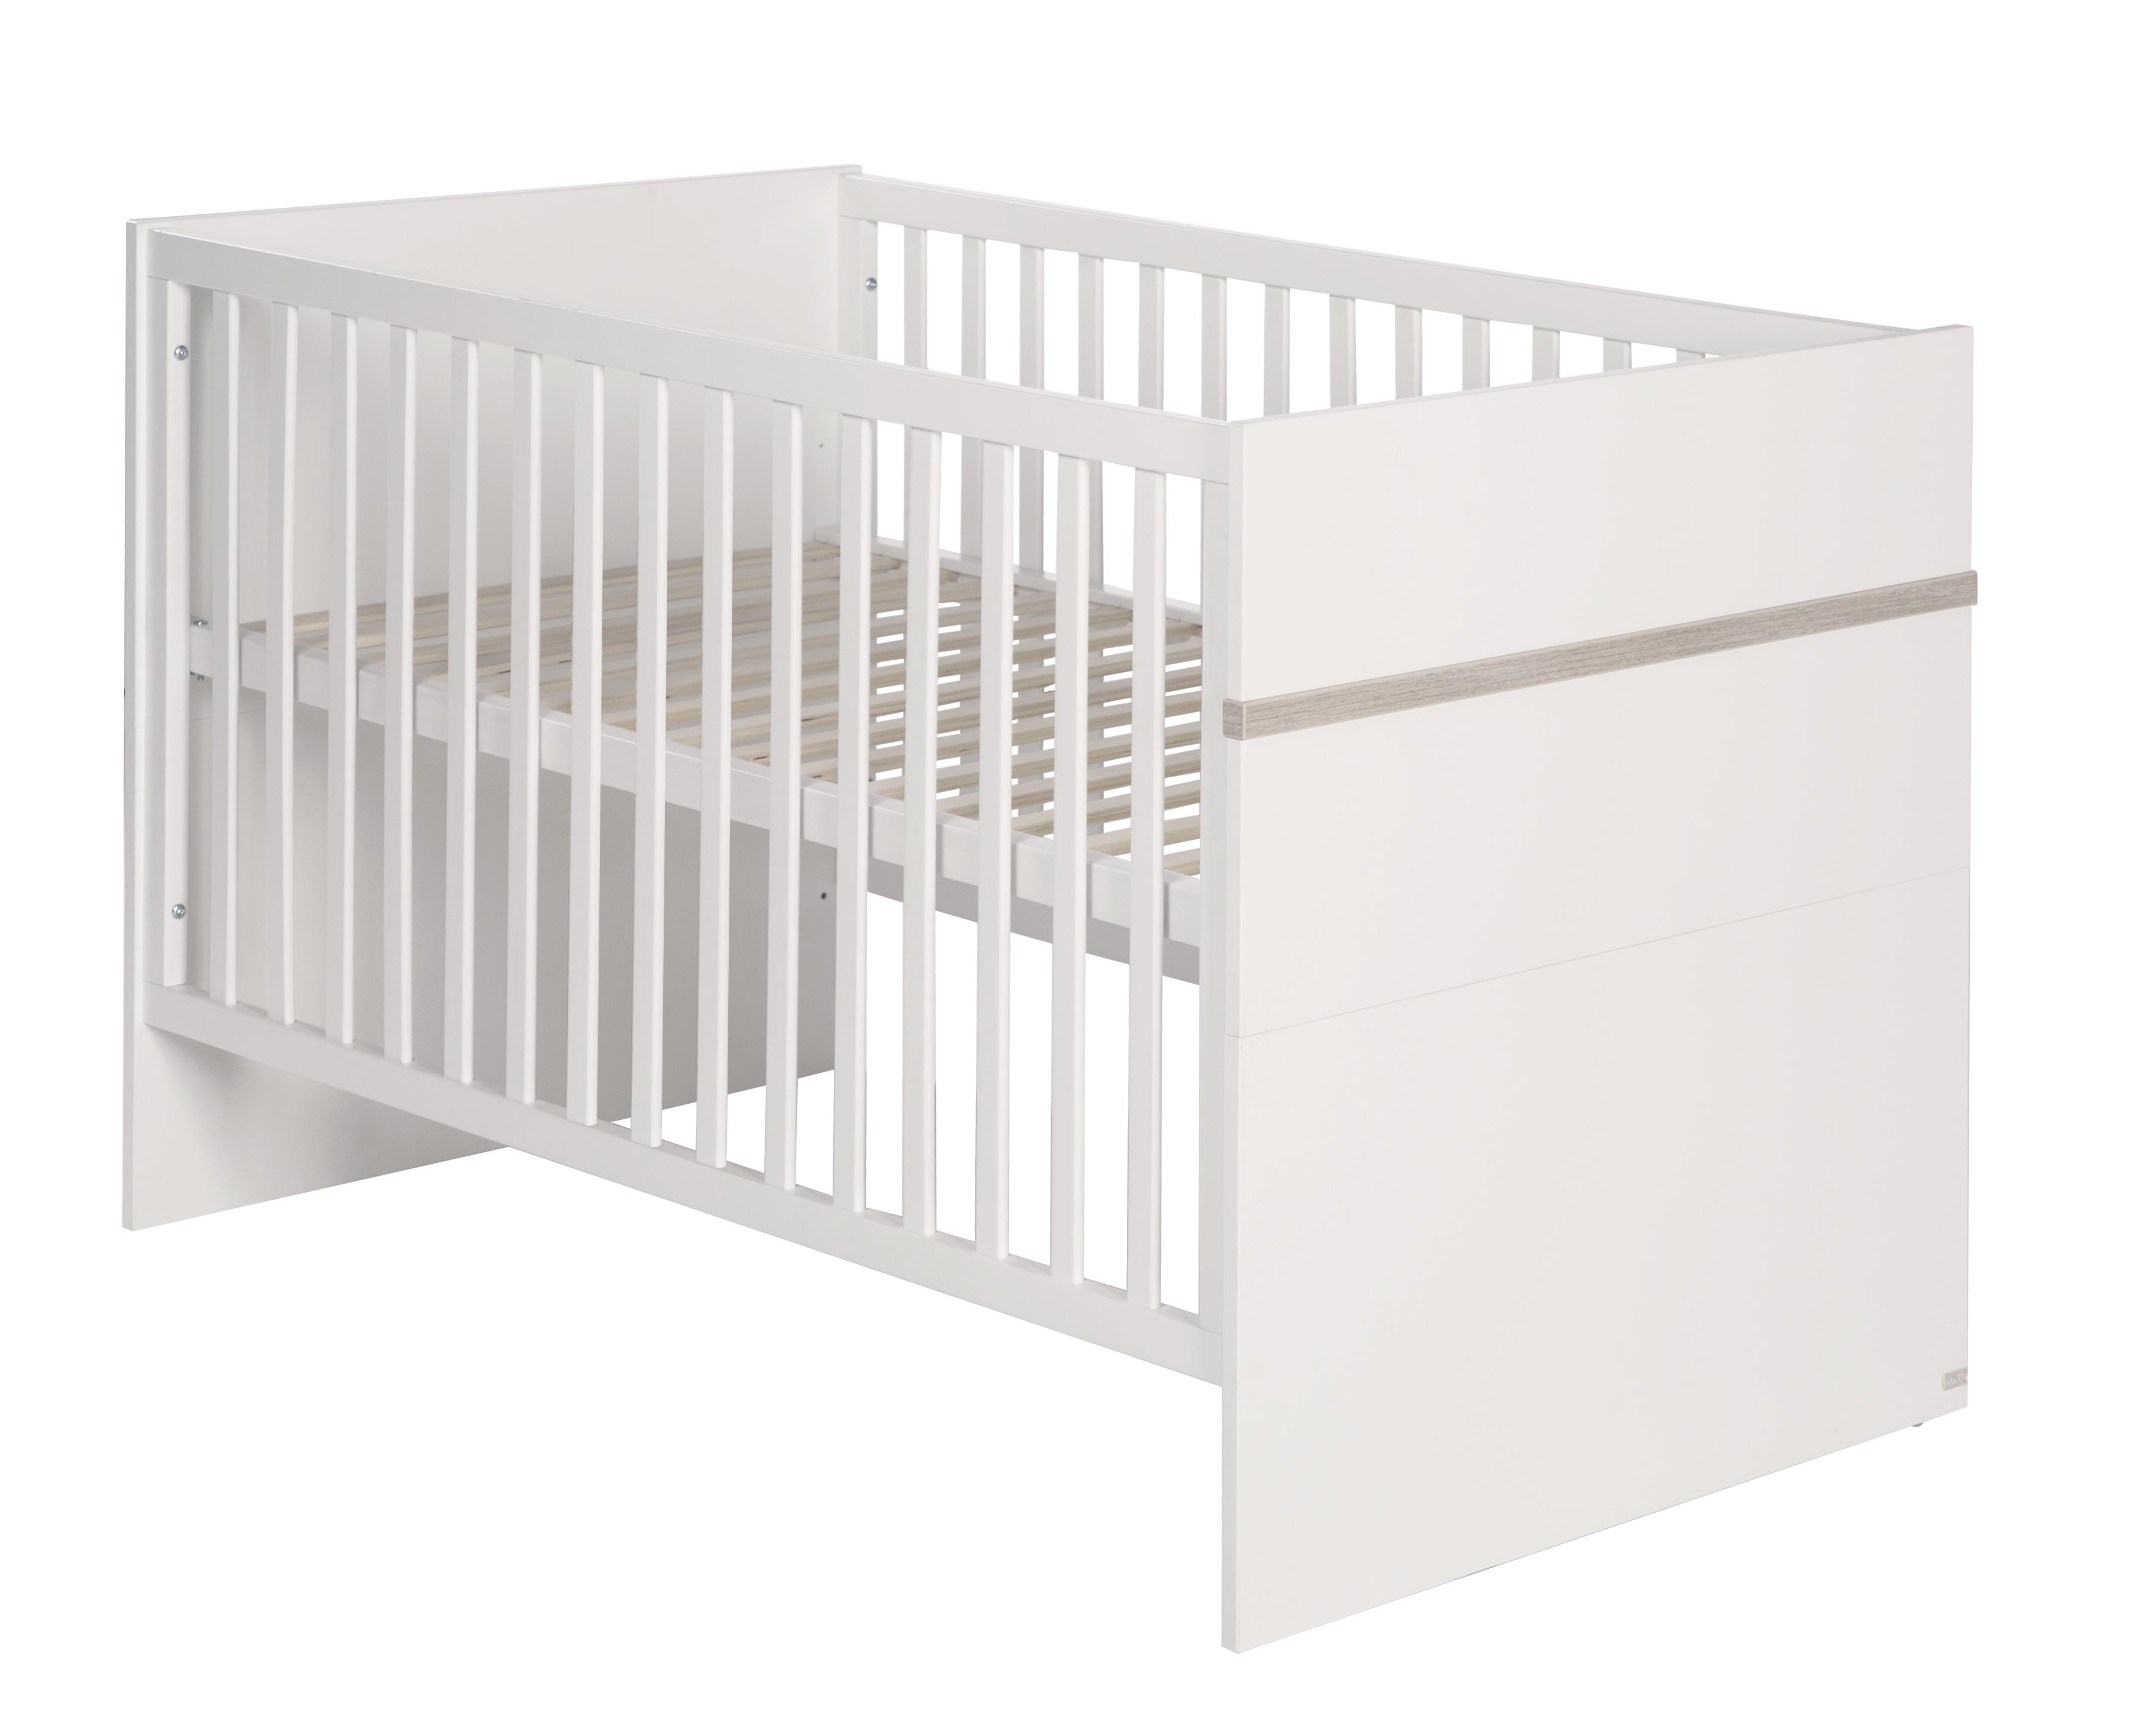 MORITZ Kombi-Kinderbett